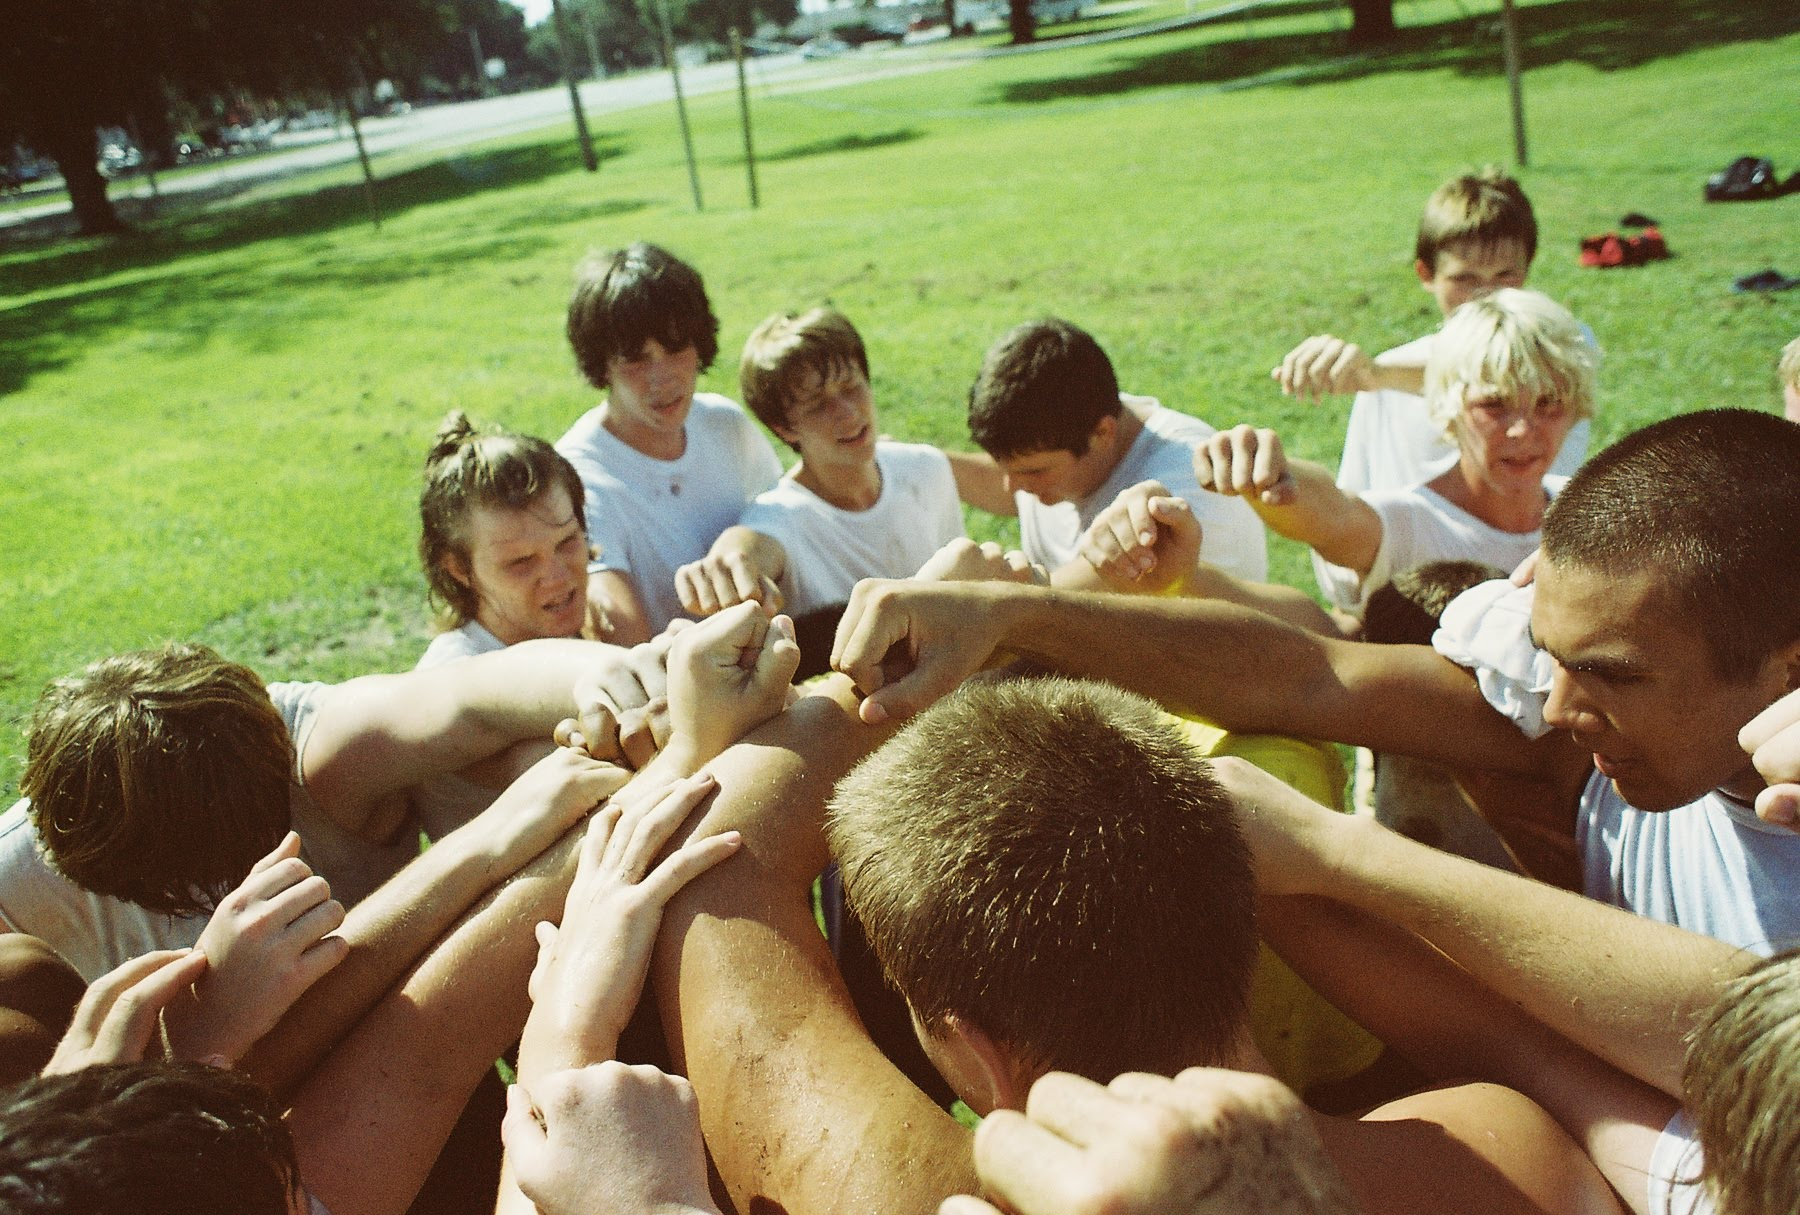 football_3737886268_o.jpg